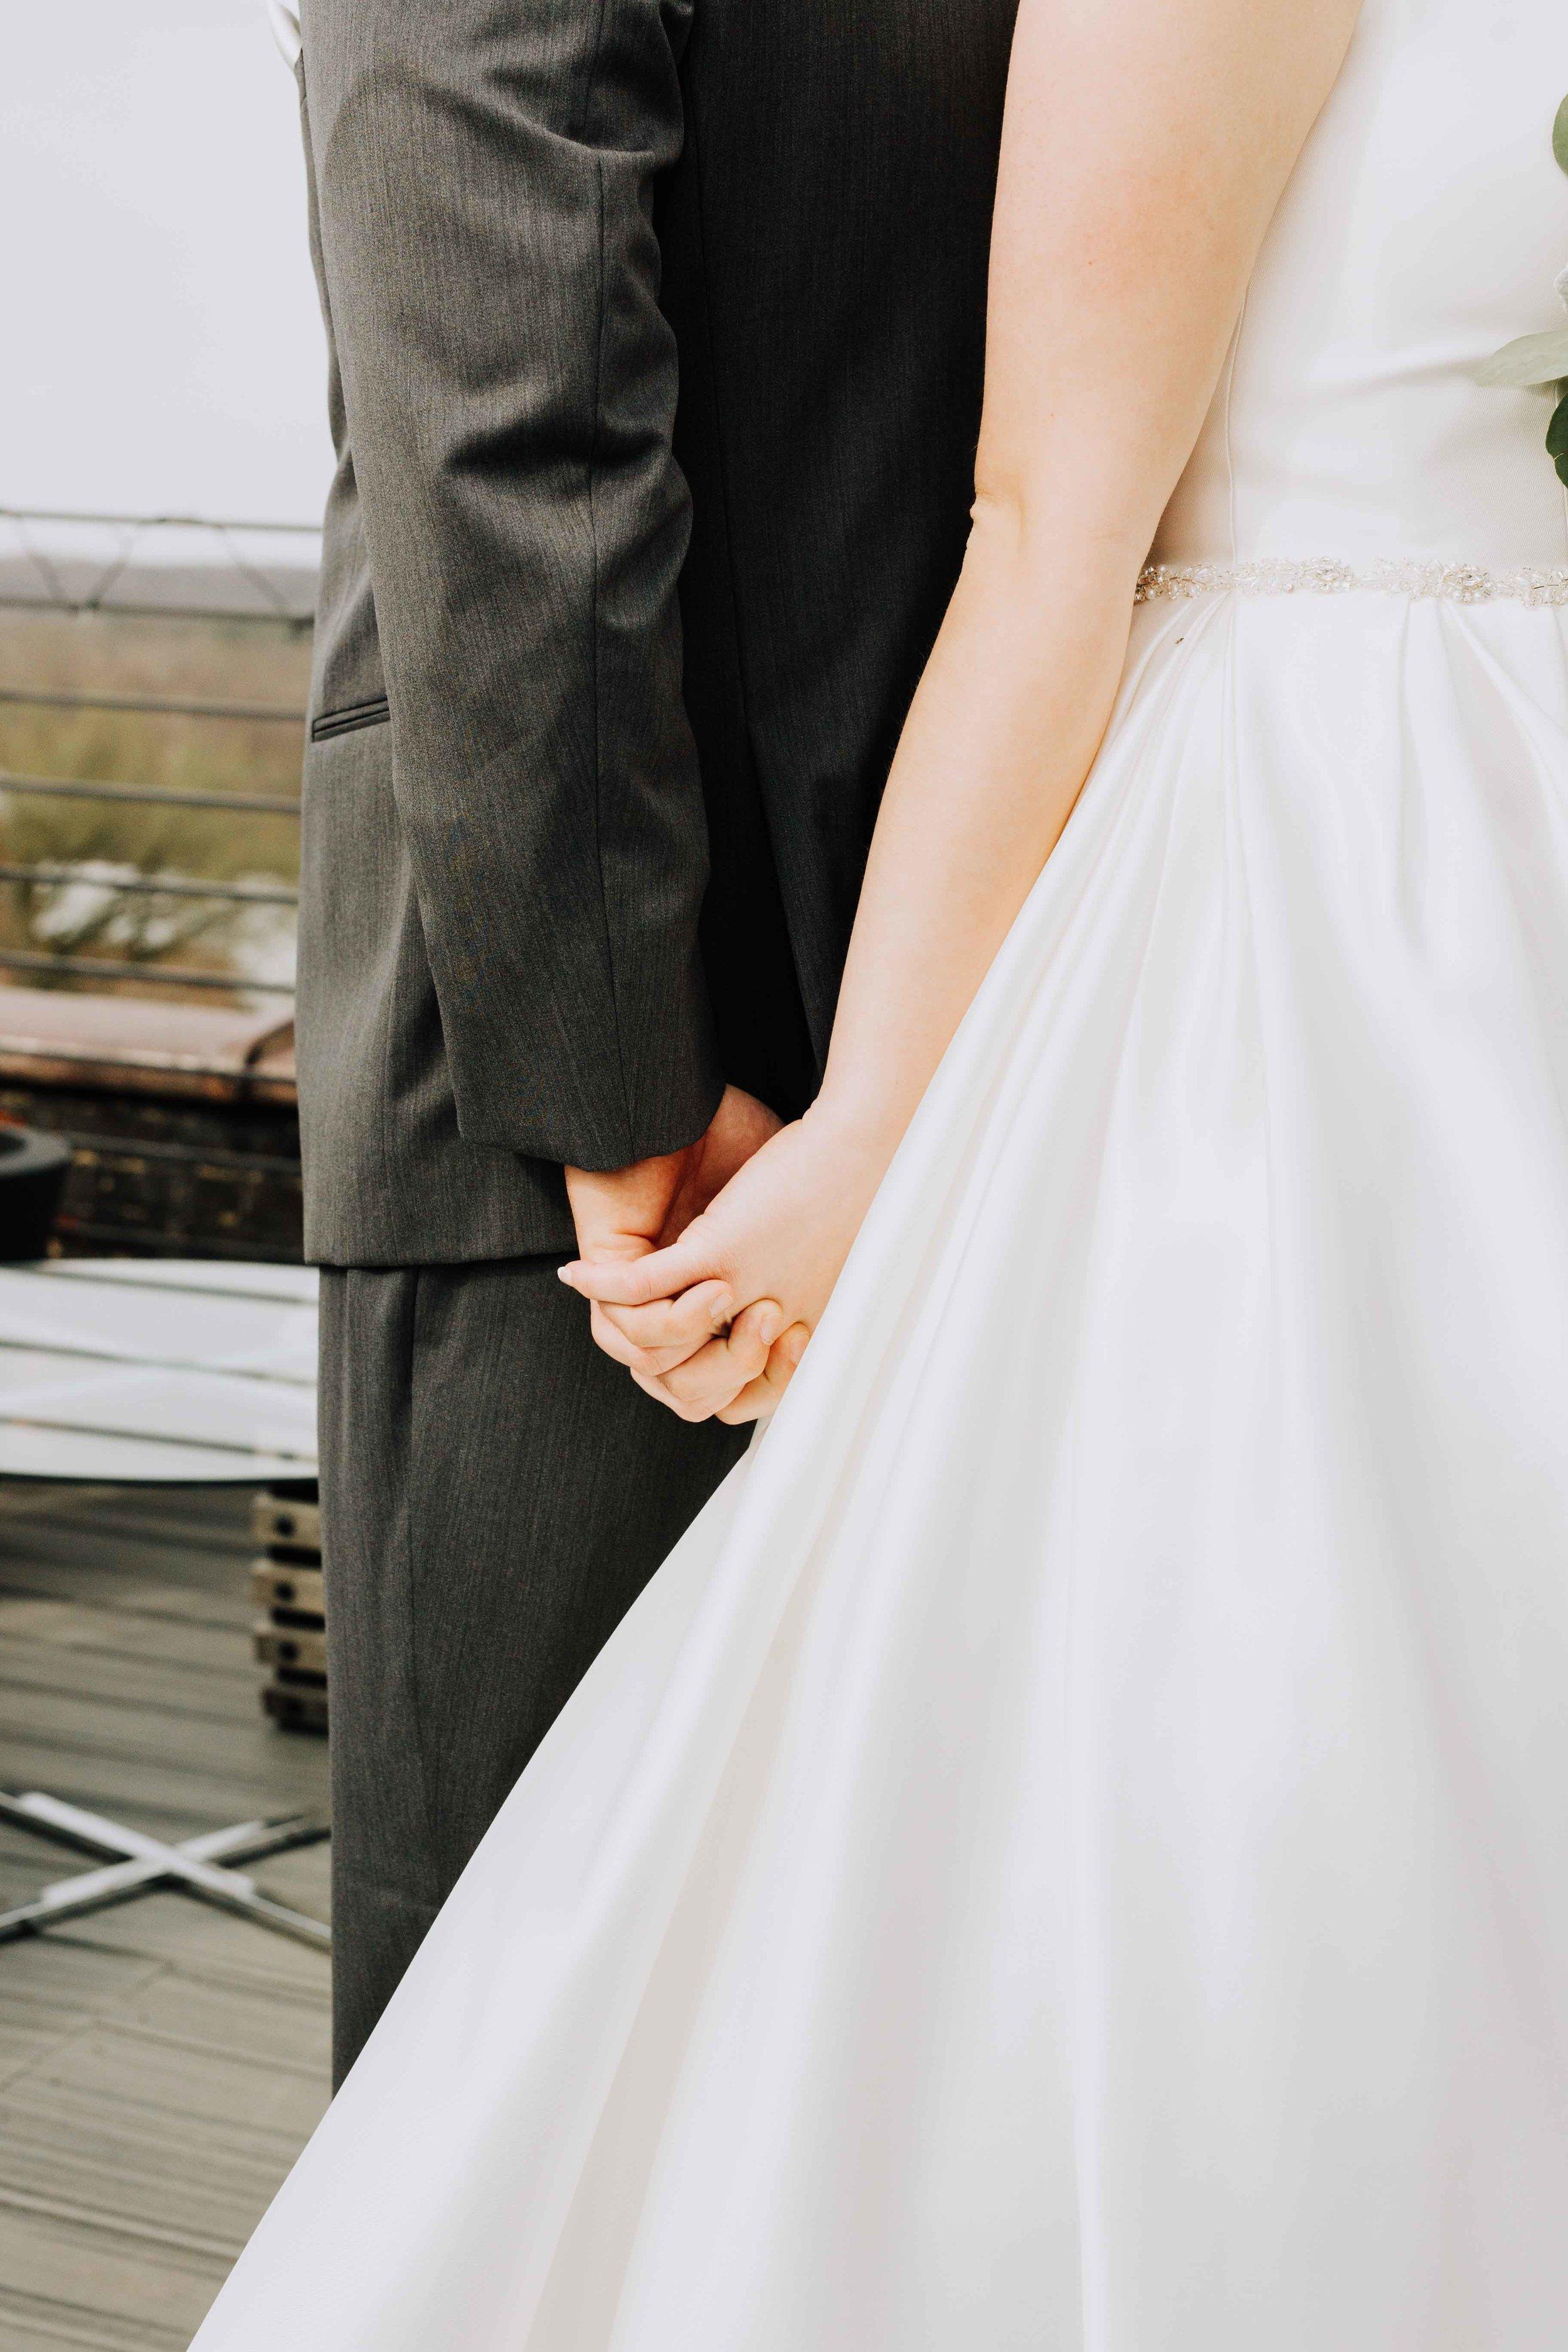 Farmville-Virginia-Wedding-Hotel-Weynoke-Downtown-Jacqueline-Waters-Photography-Detailed- (504).jpg